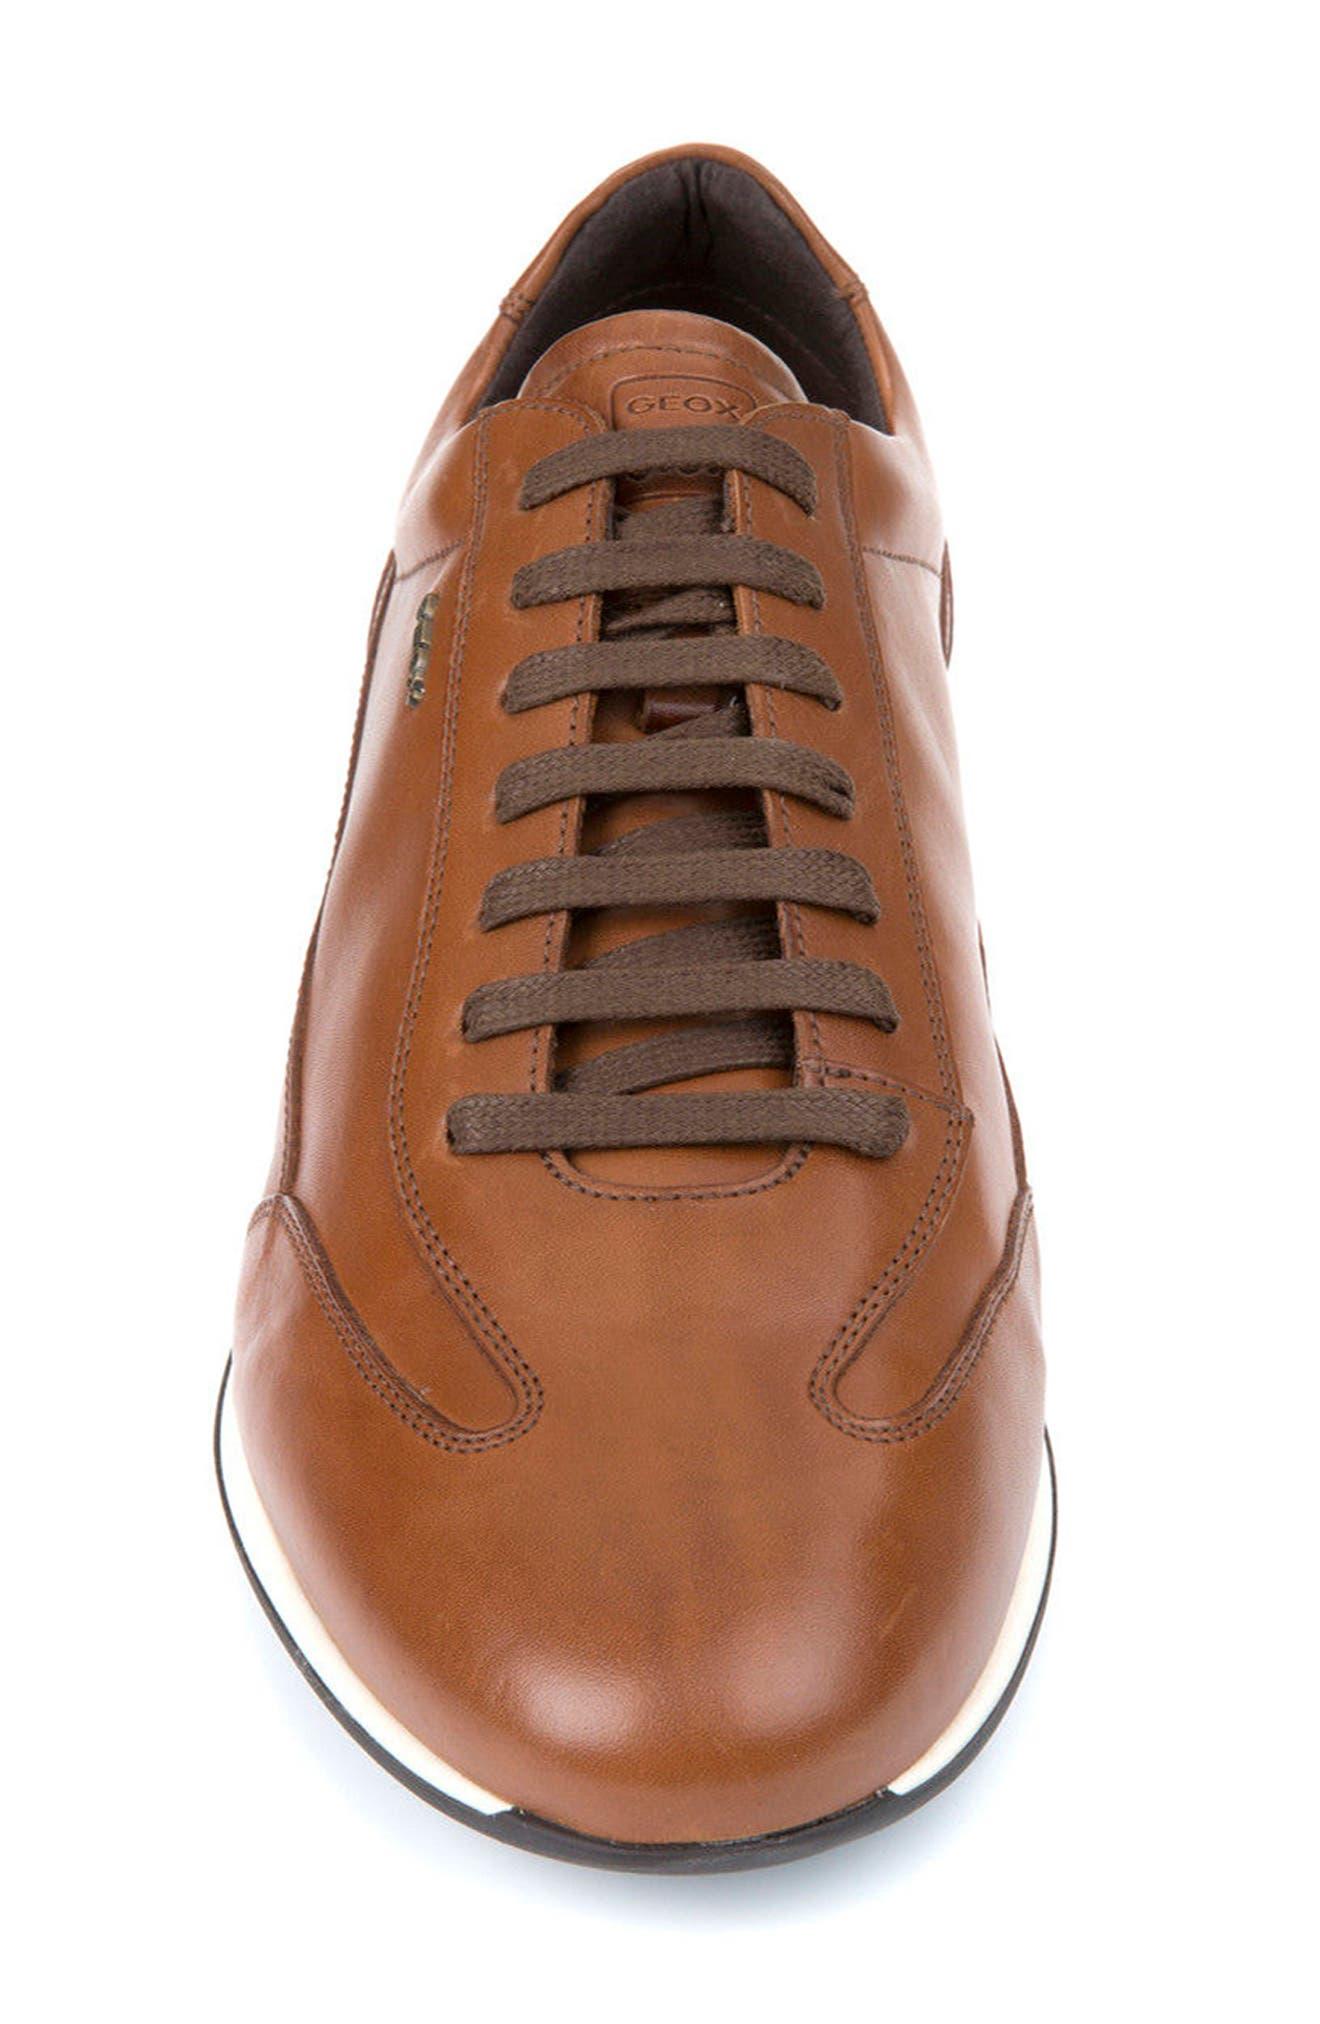 Alternate Image 4  - Geox Clemet 1 Sneaker (Men)